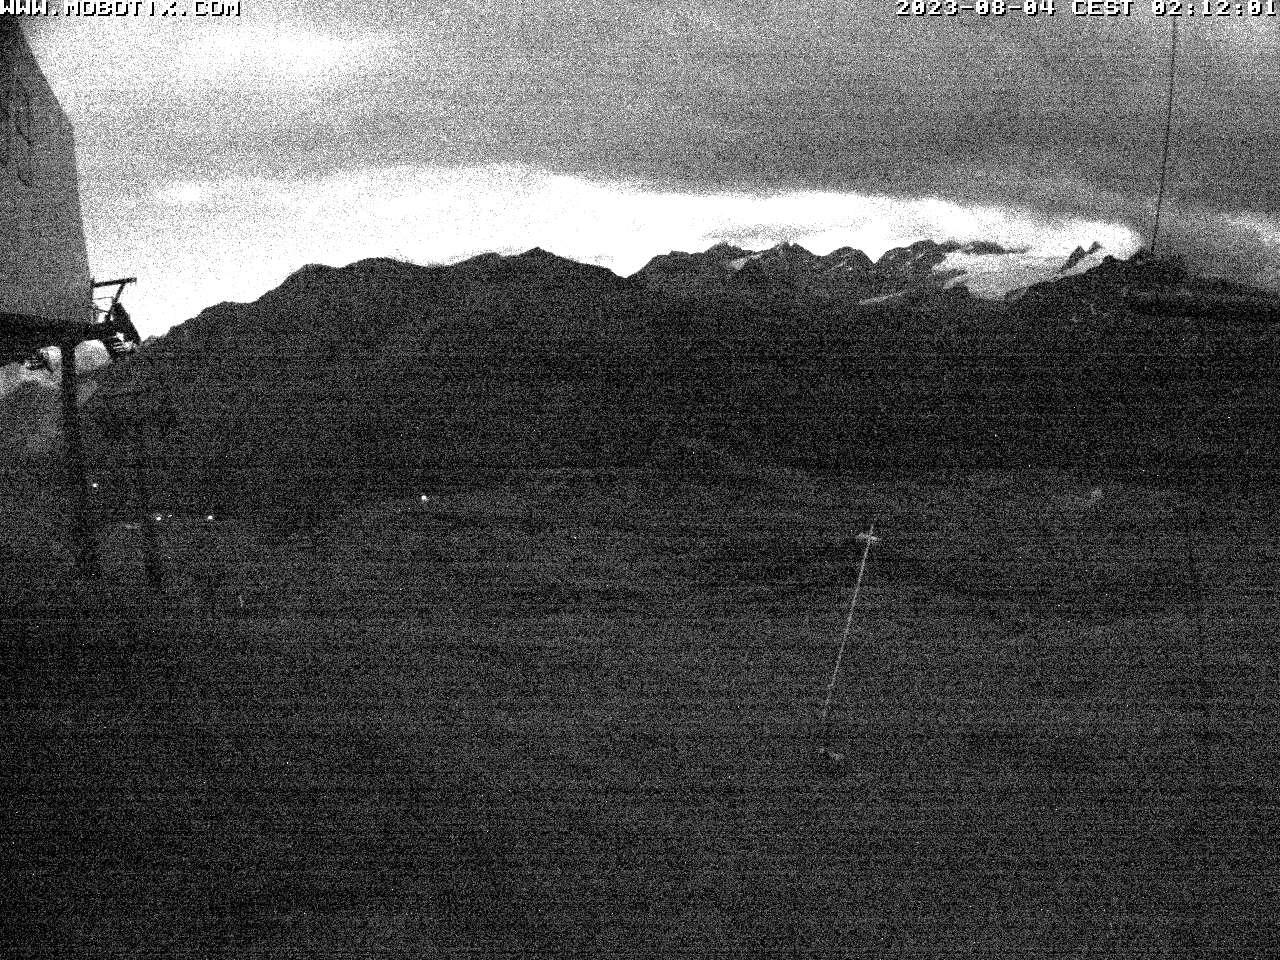 La Thuile 2.600 m - Chaz Dura - Arrivo Chaz Dura Express